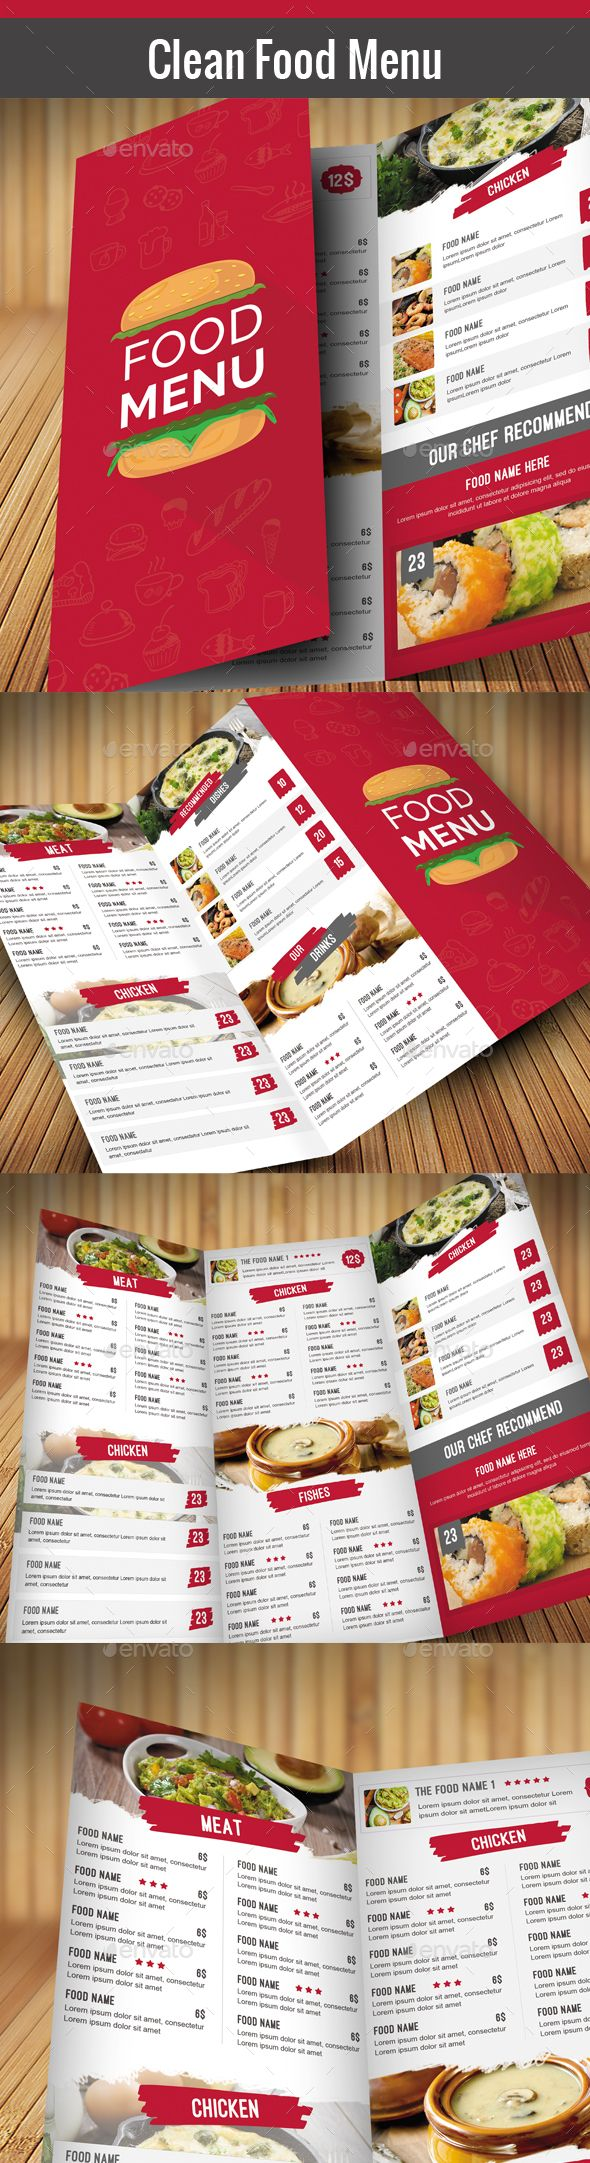 Clean Food Menu Template PSD #design Download: http://graphicriver.net/item/clean-food-menu/14419400?ref=ksioks